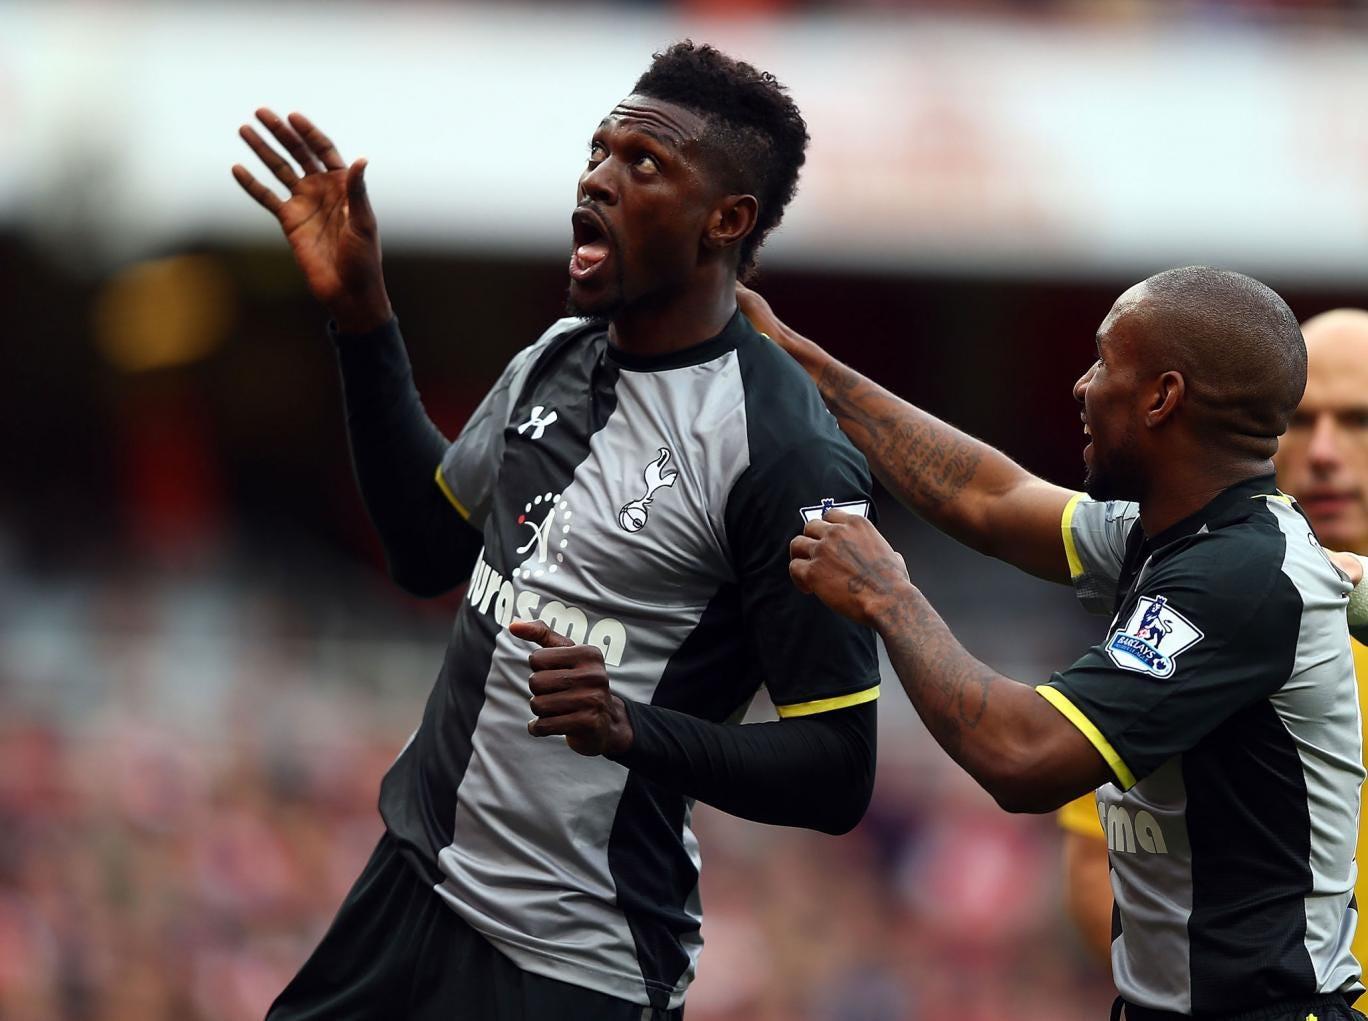 Emmanuel Adebayor celebrates his opener for Tottenham Hotspur against Arsenal